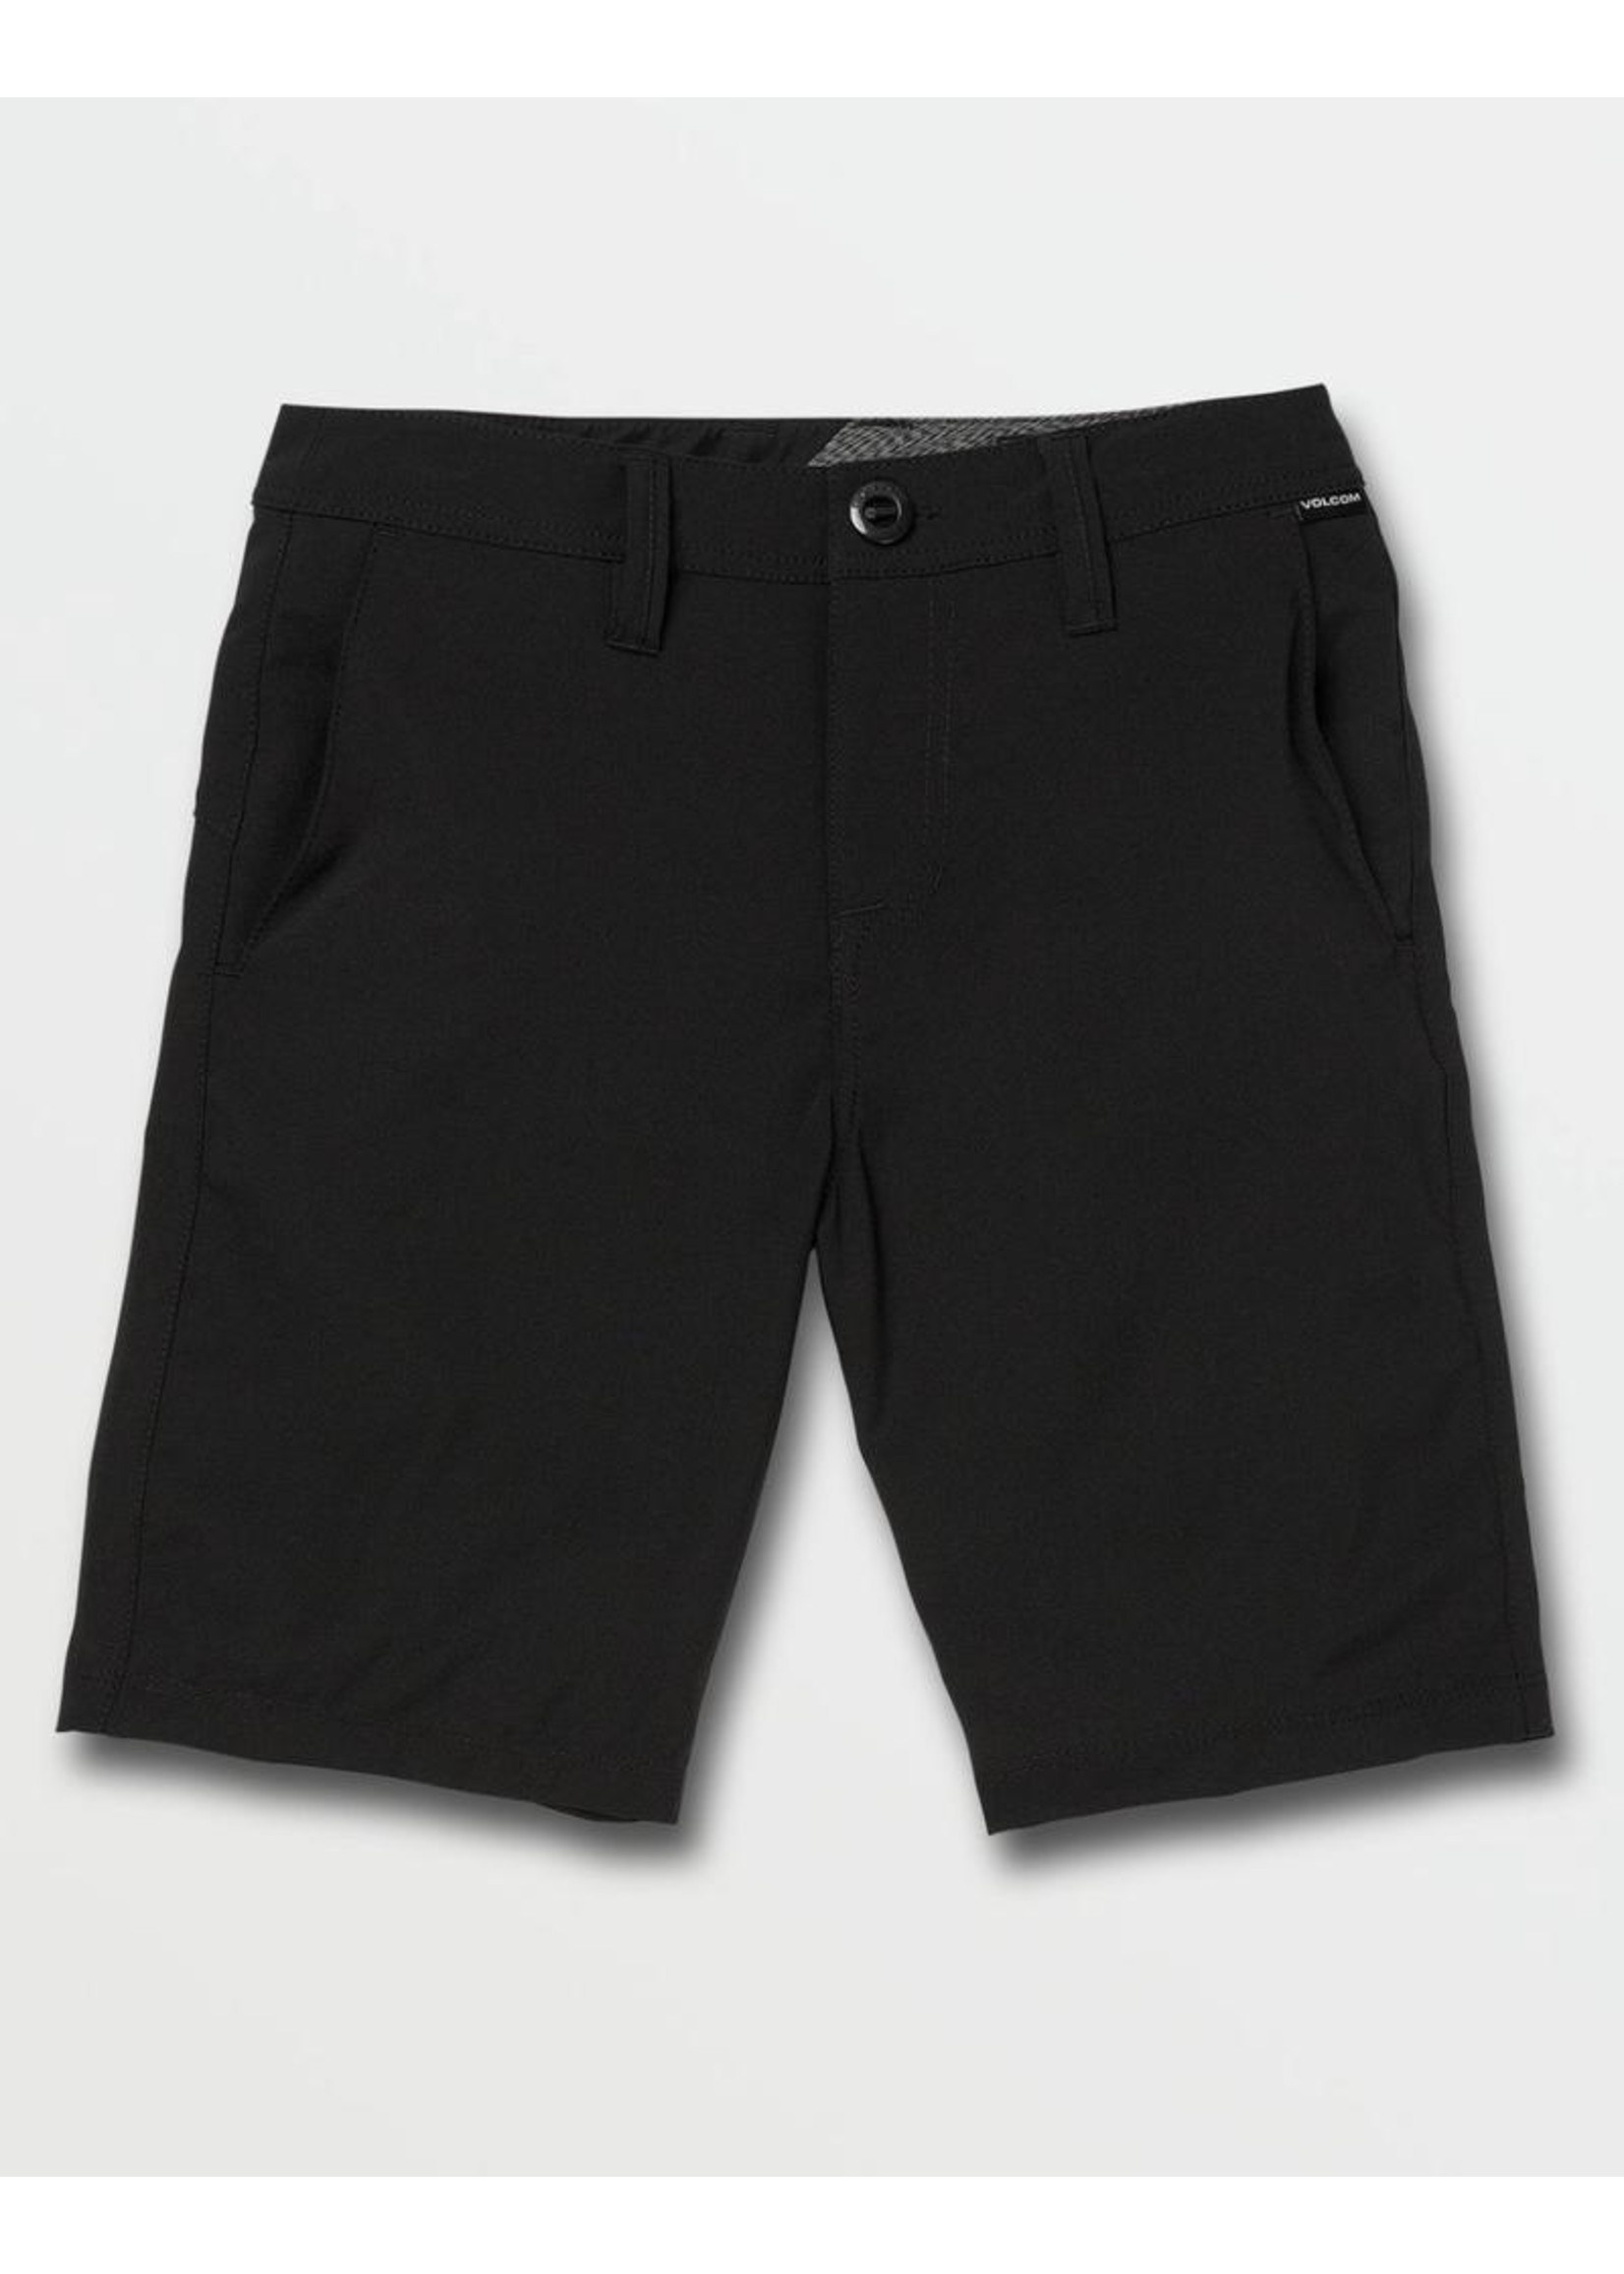 Volcom Volcom Kids, Big Boys Blackout Fricken Surf N' Turf Static Shorts